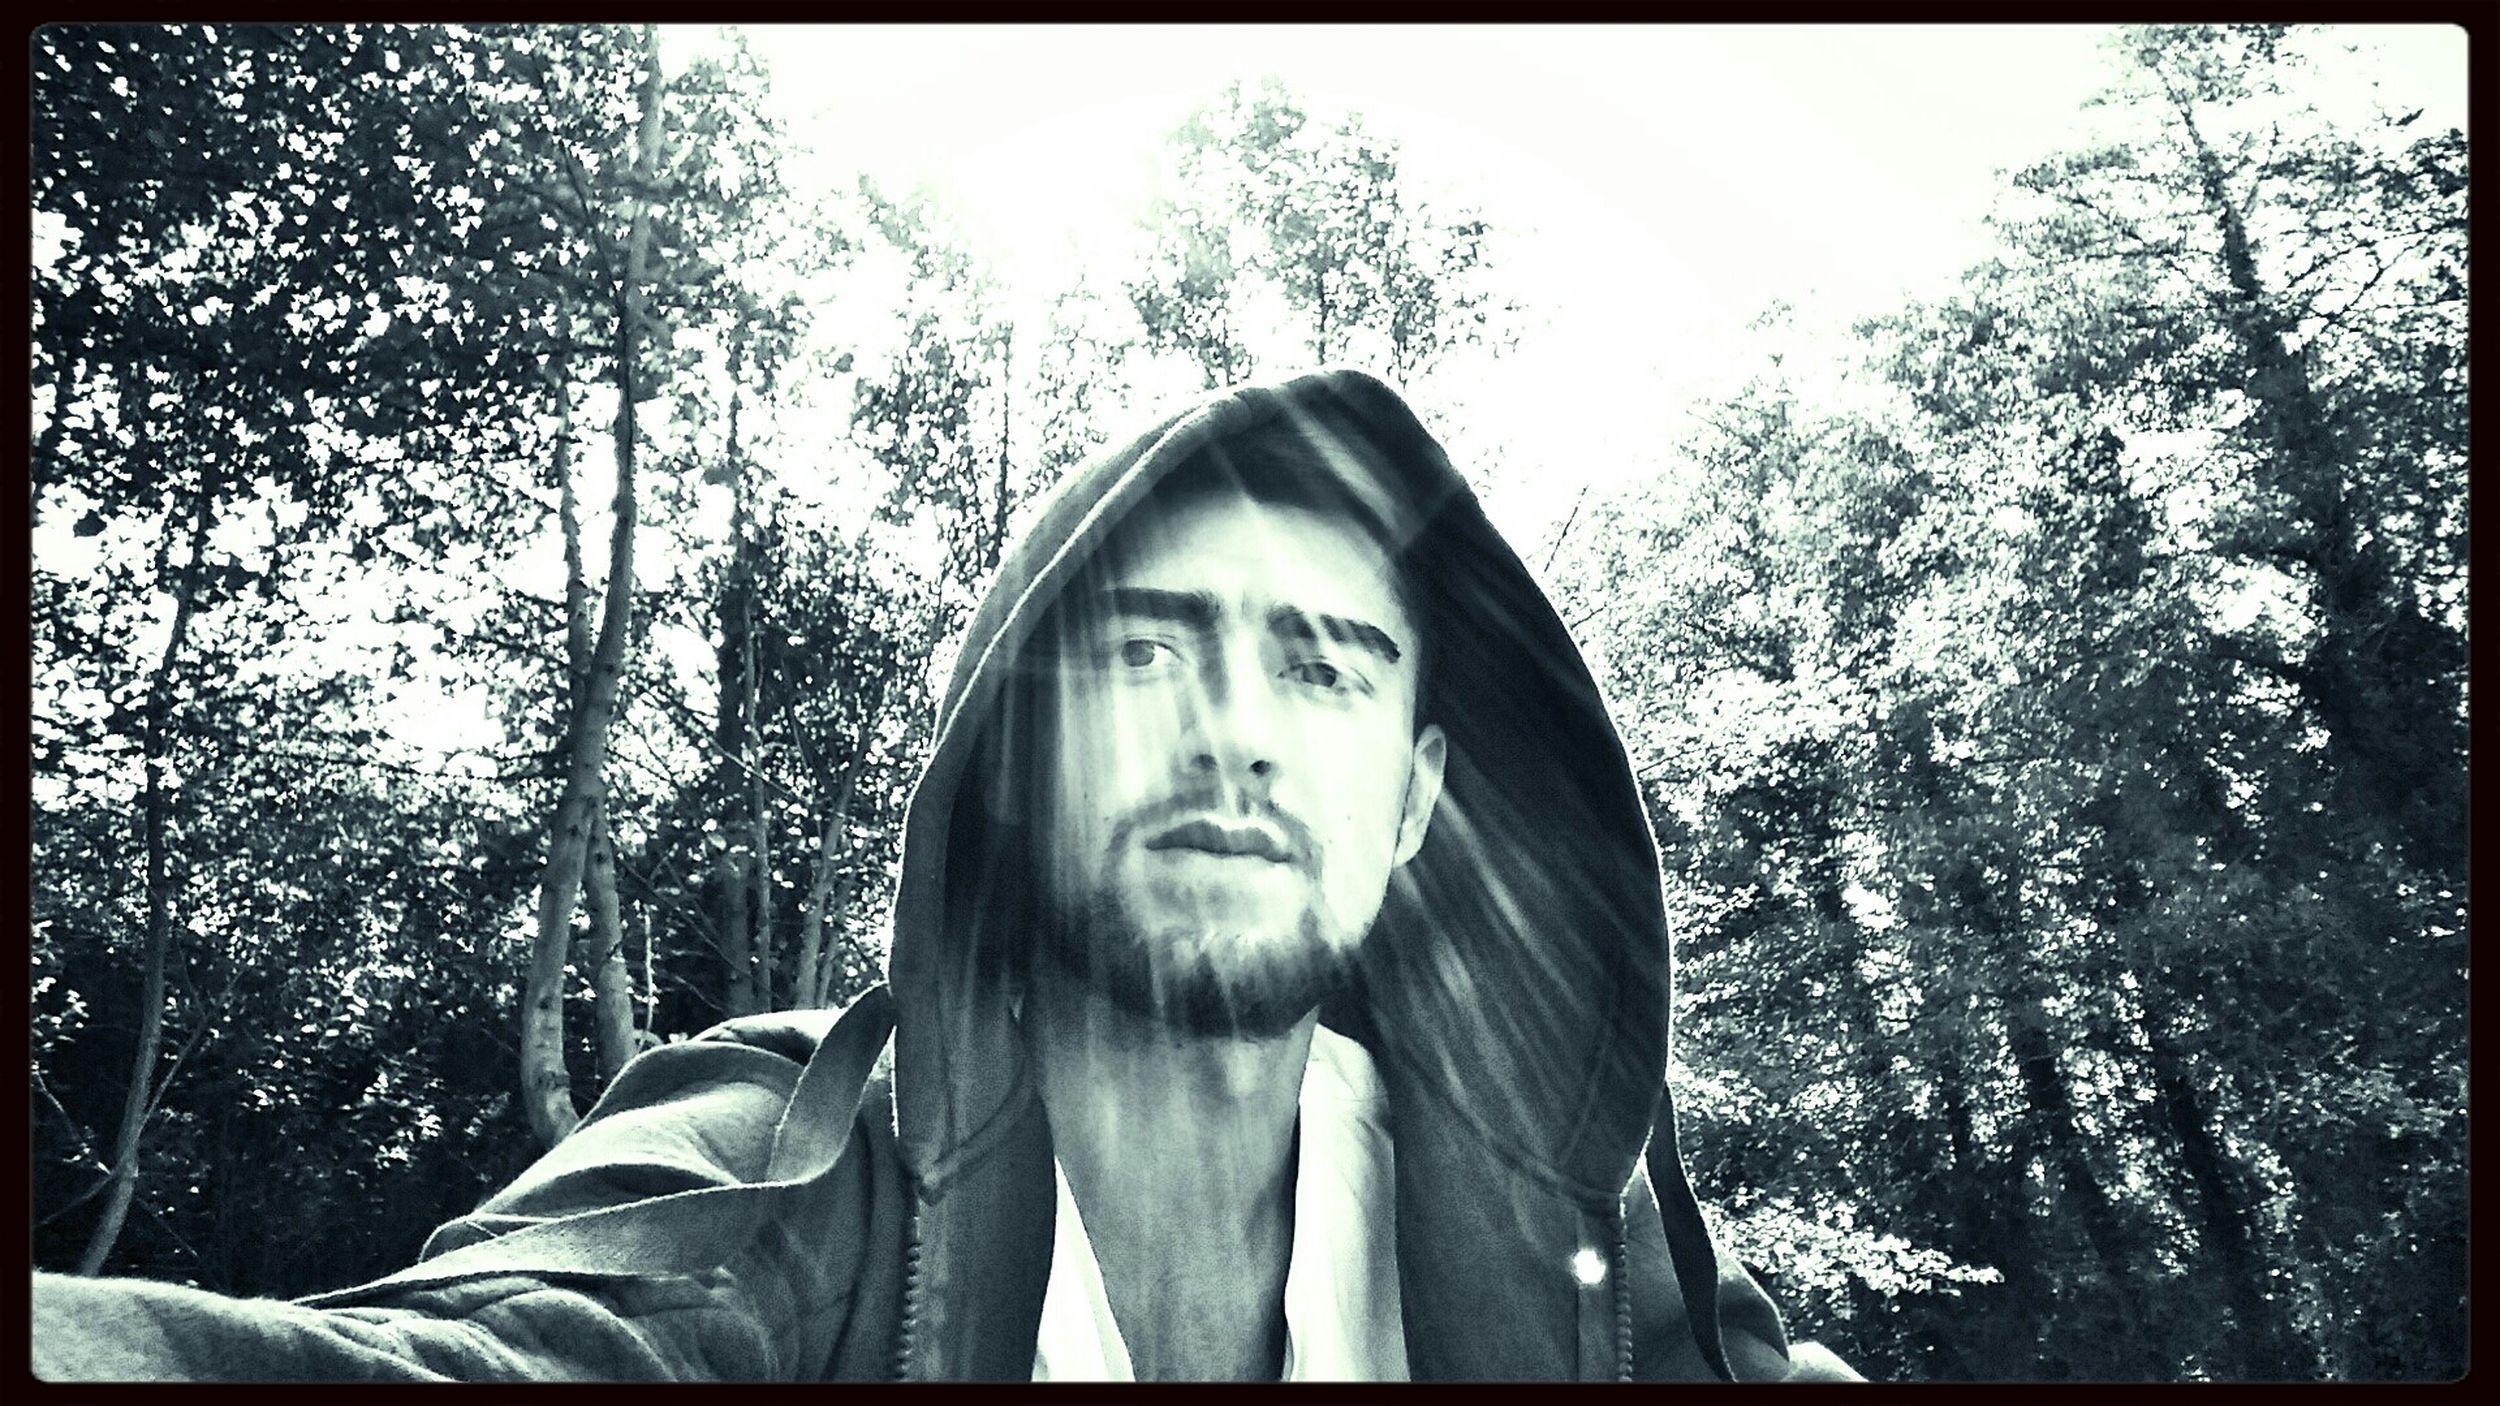 Karanliktan korkmuyorum eskisi gibi senin yuzun hep aydinlik Hi! Black & White Blackandwhite Self Portrait